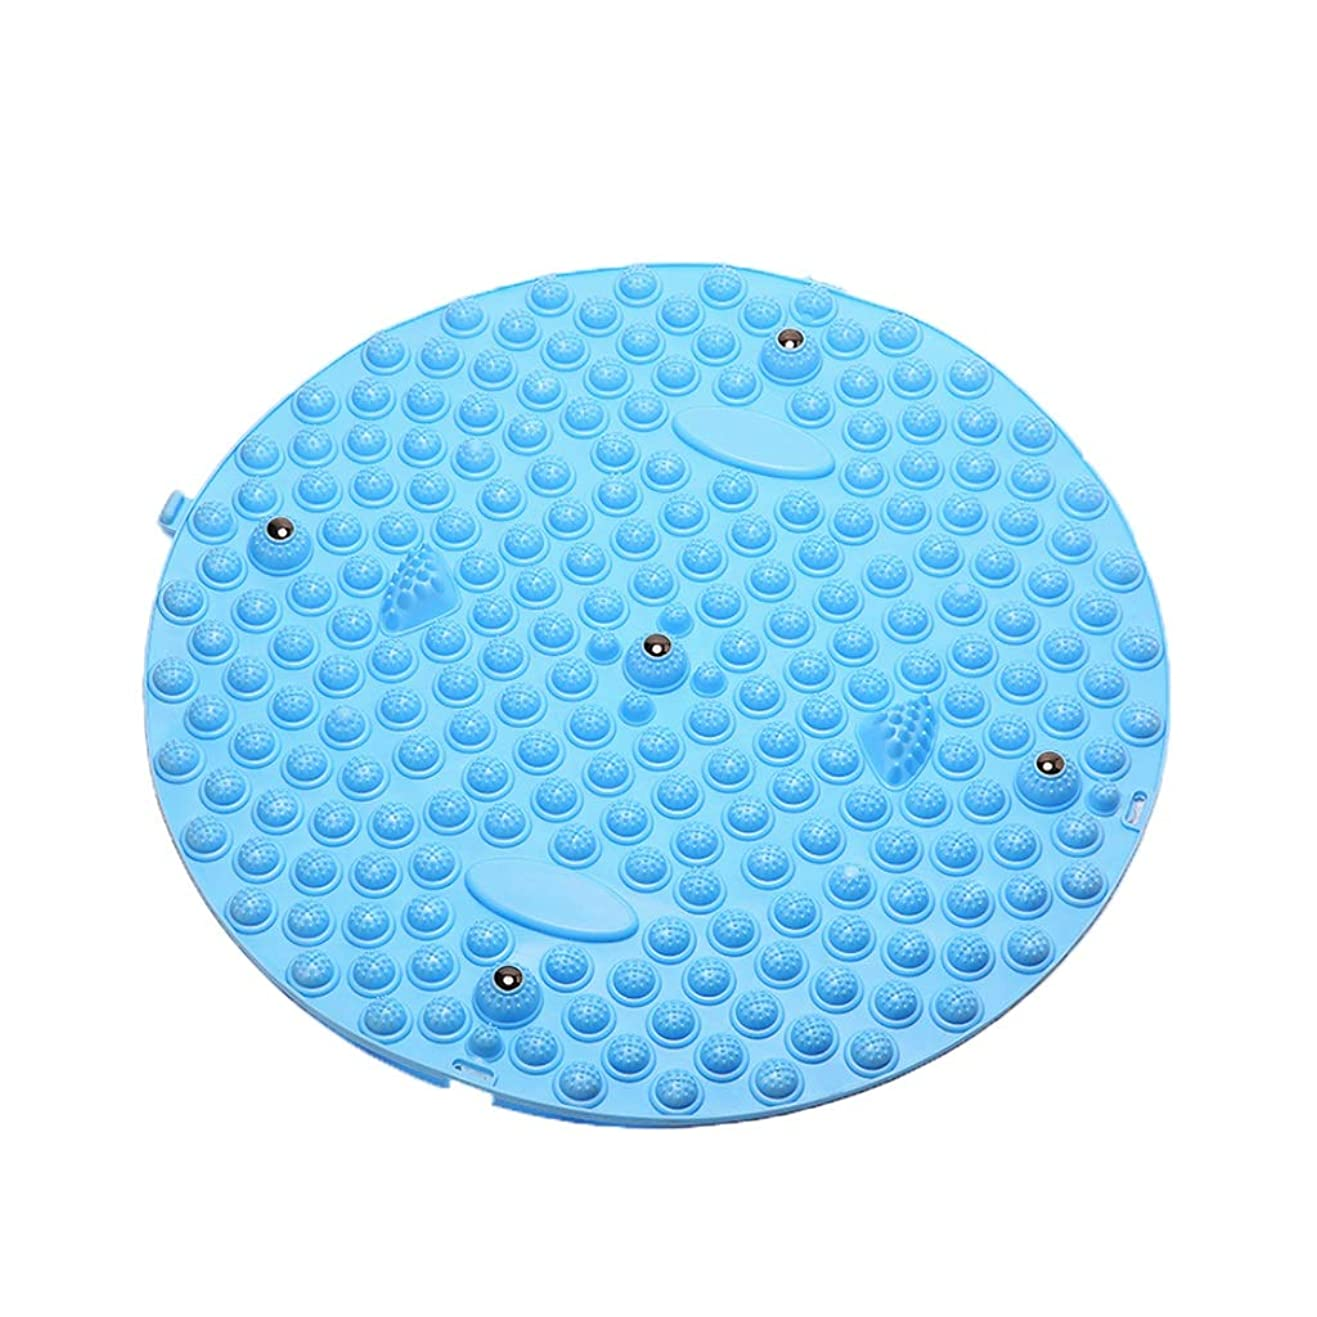 ZHWNGXO フットマッサージクッションドアマット磁気ストーンデザイン丸型強い支持力該当するもの屋外フィットネスヨガ (Color : Blue)